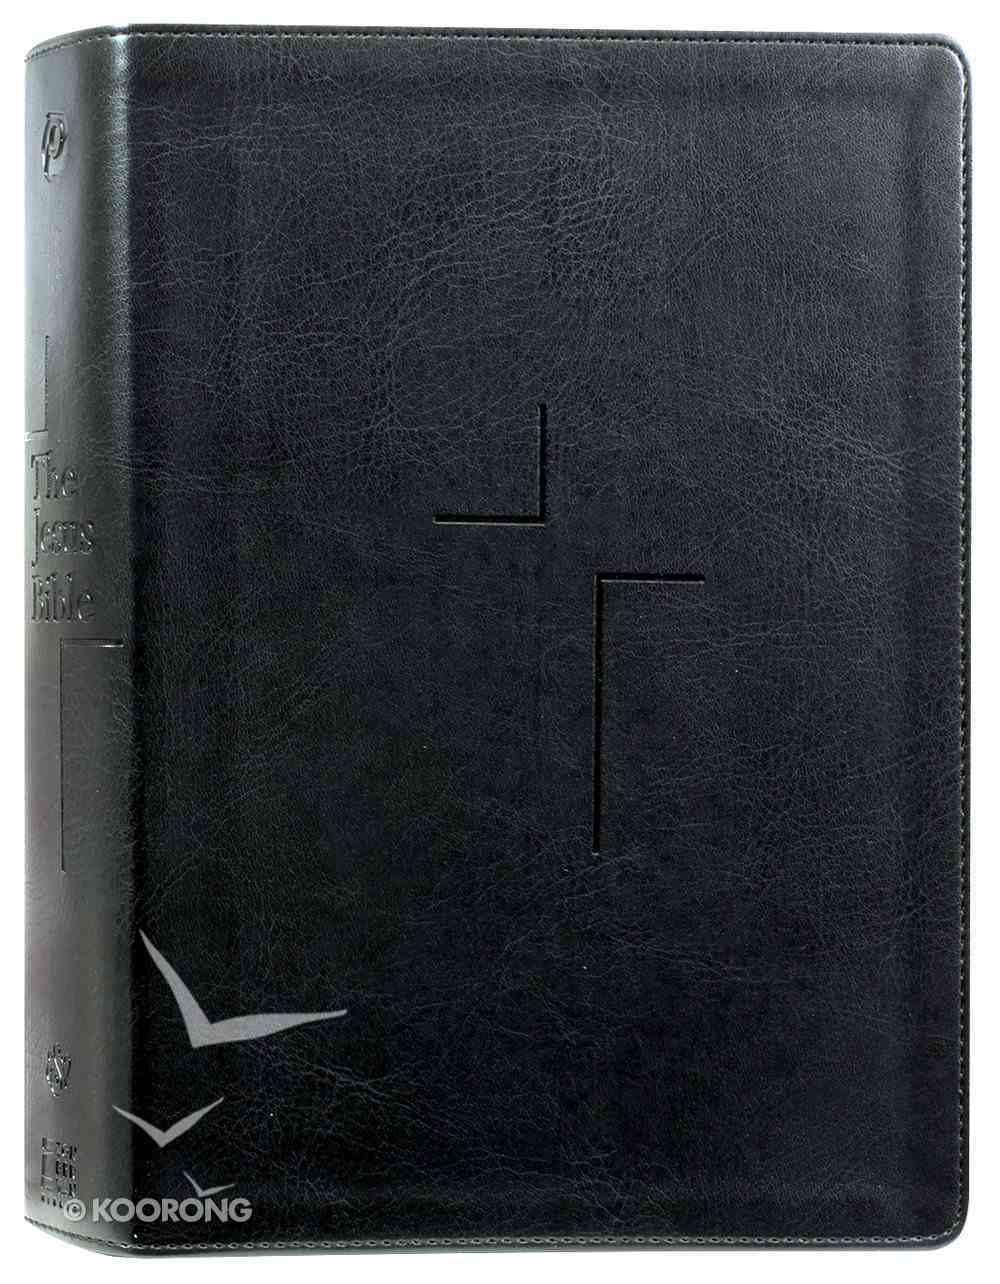 ESV the Jesus Bible Black Premium Imitation Leather